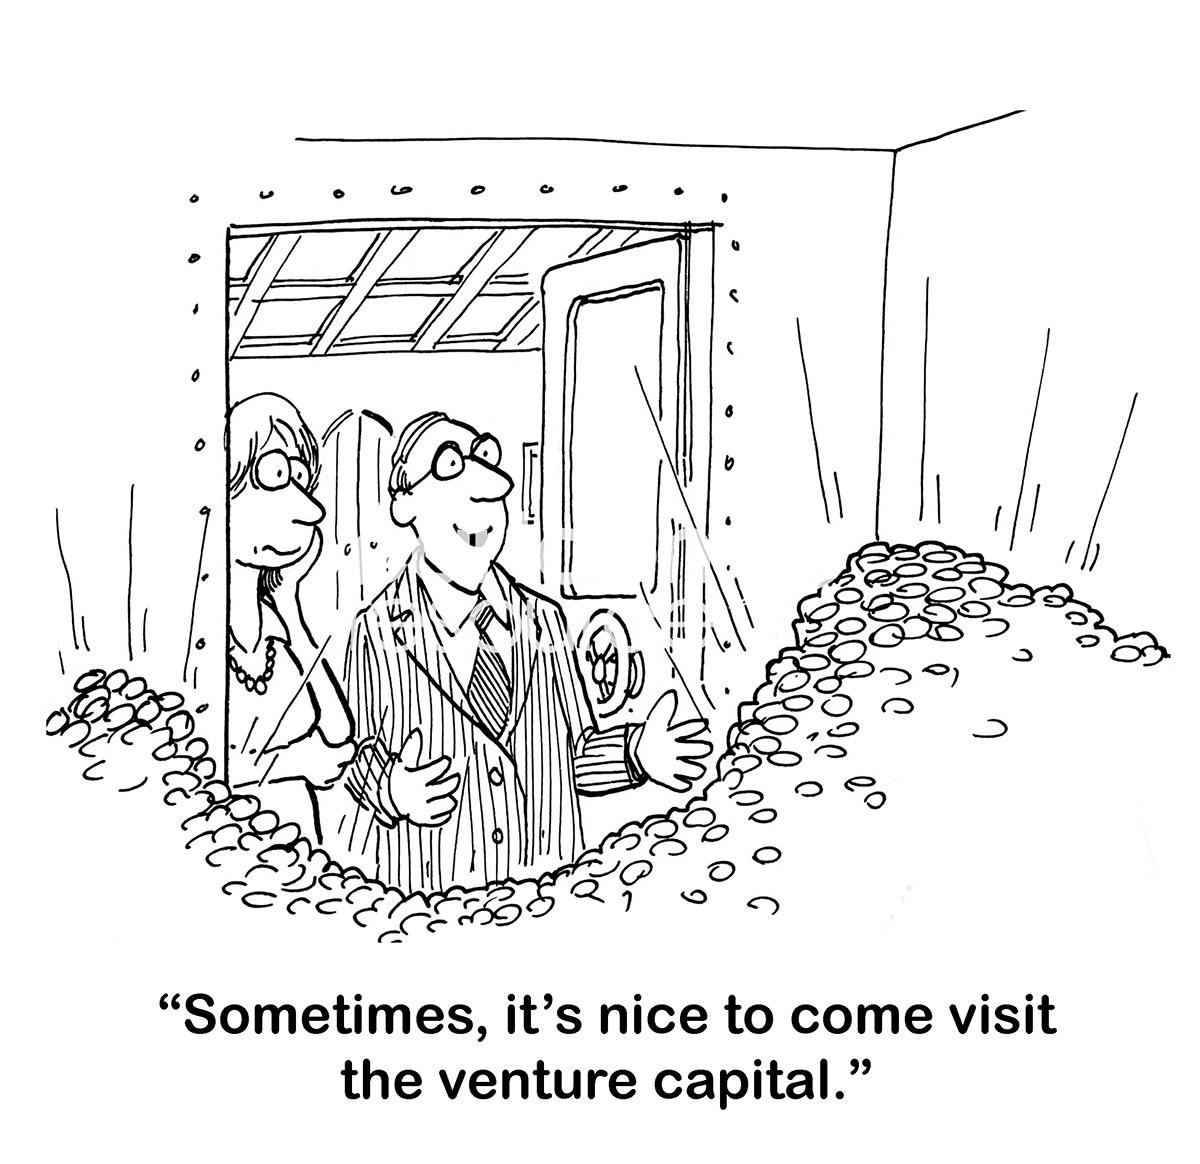 Legaltech Venture Investment